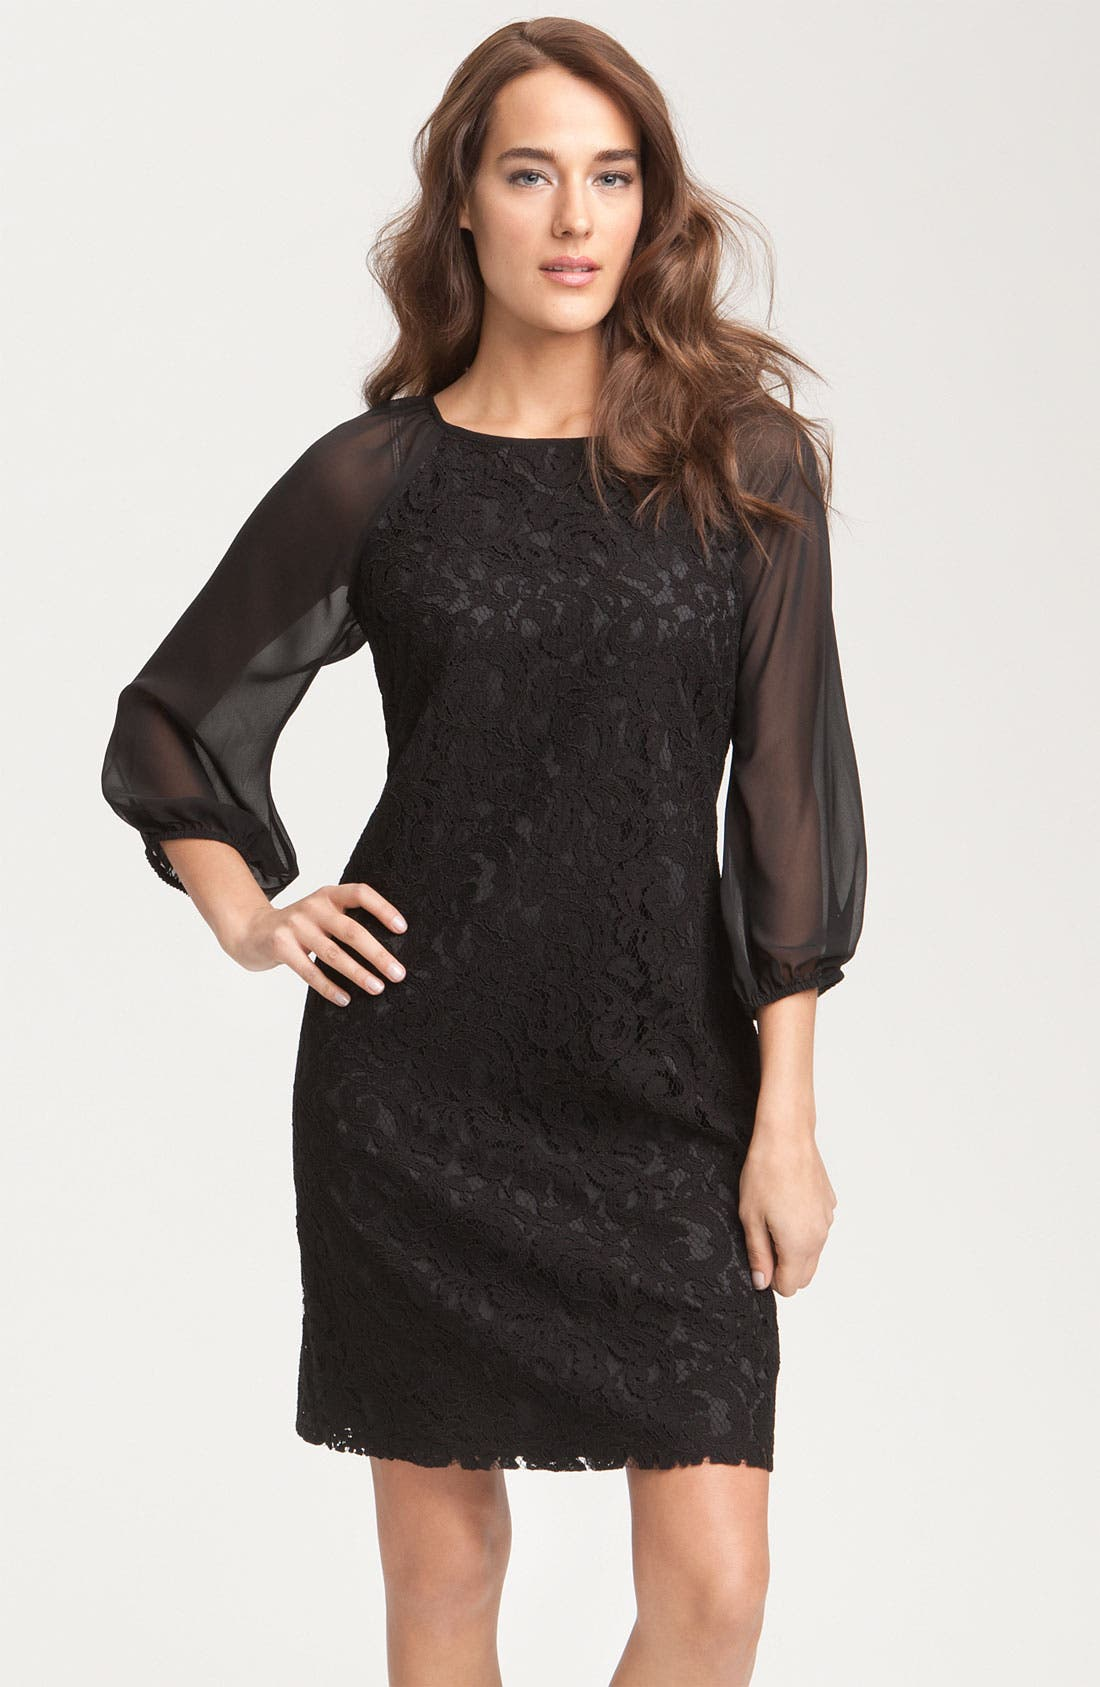 Alternate Image 1 Selected - Adrianna Papell Lace & Chiffon Shift Dress